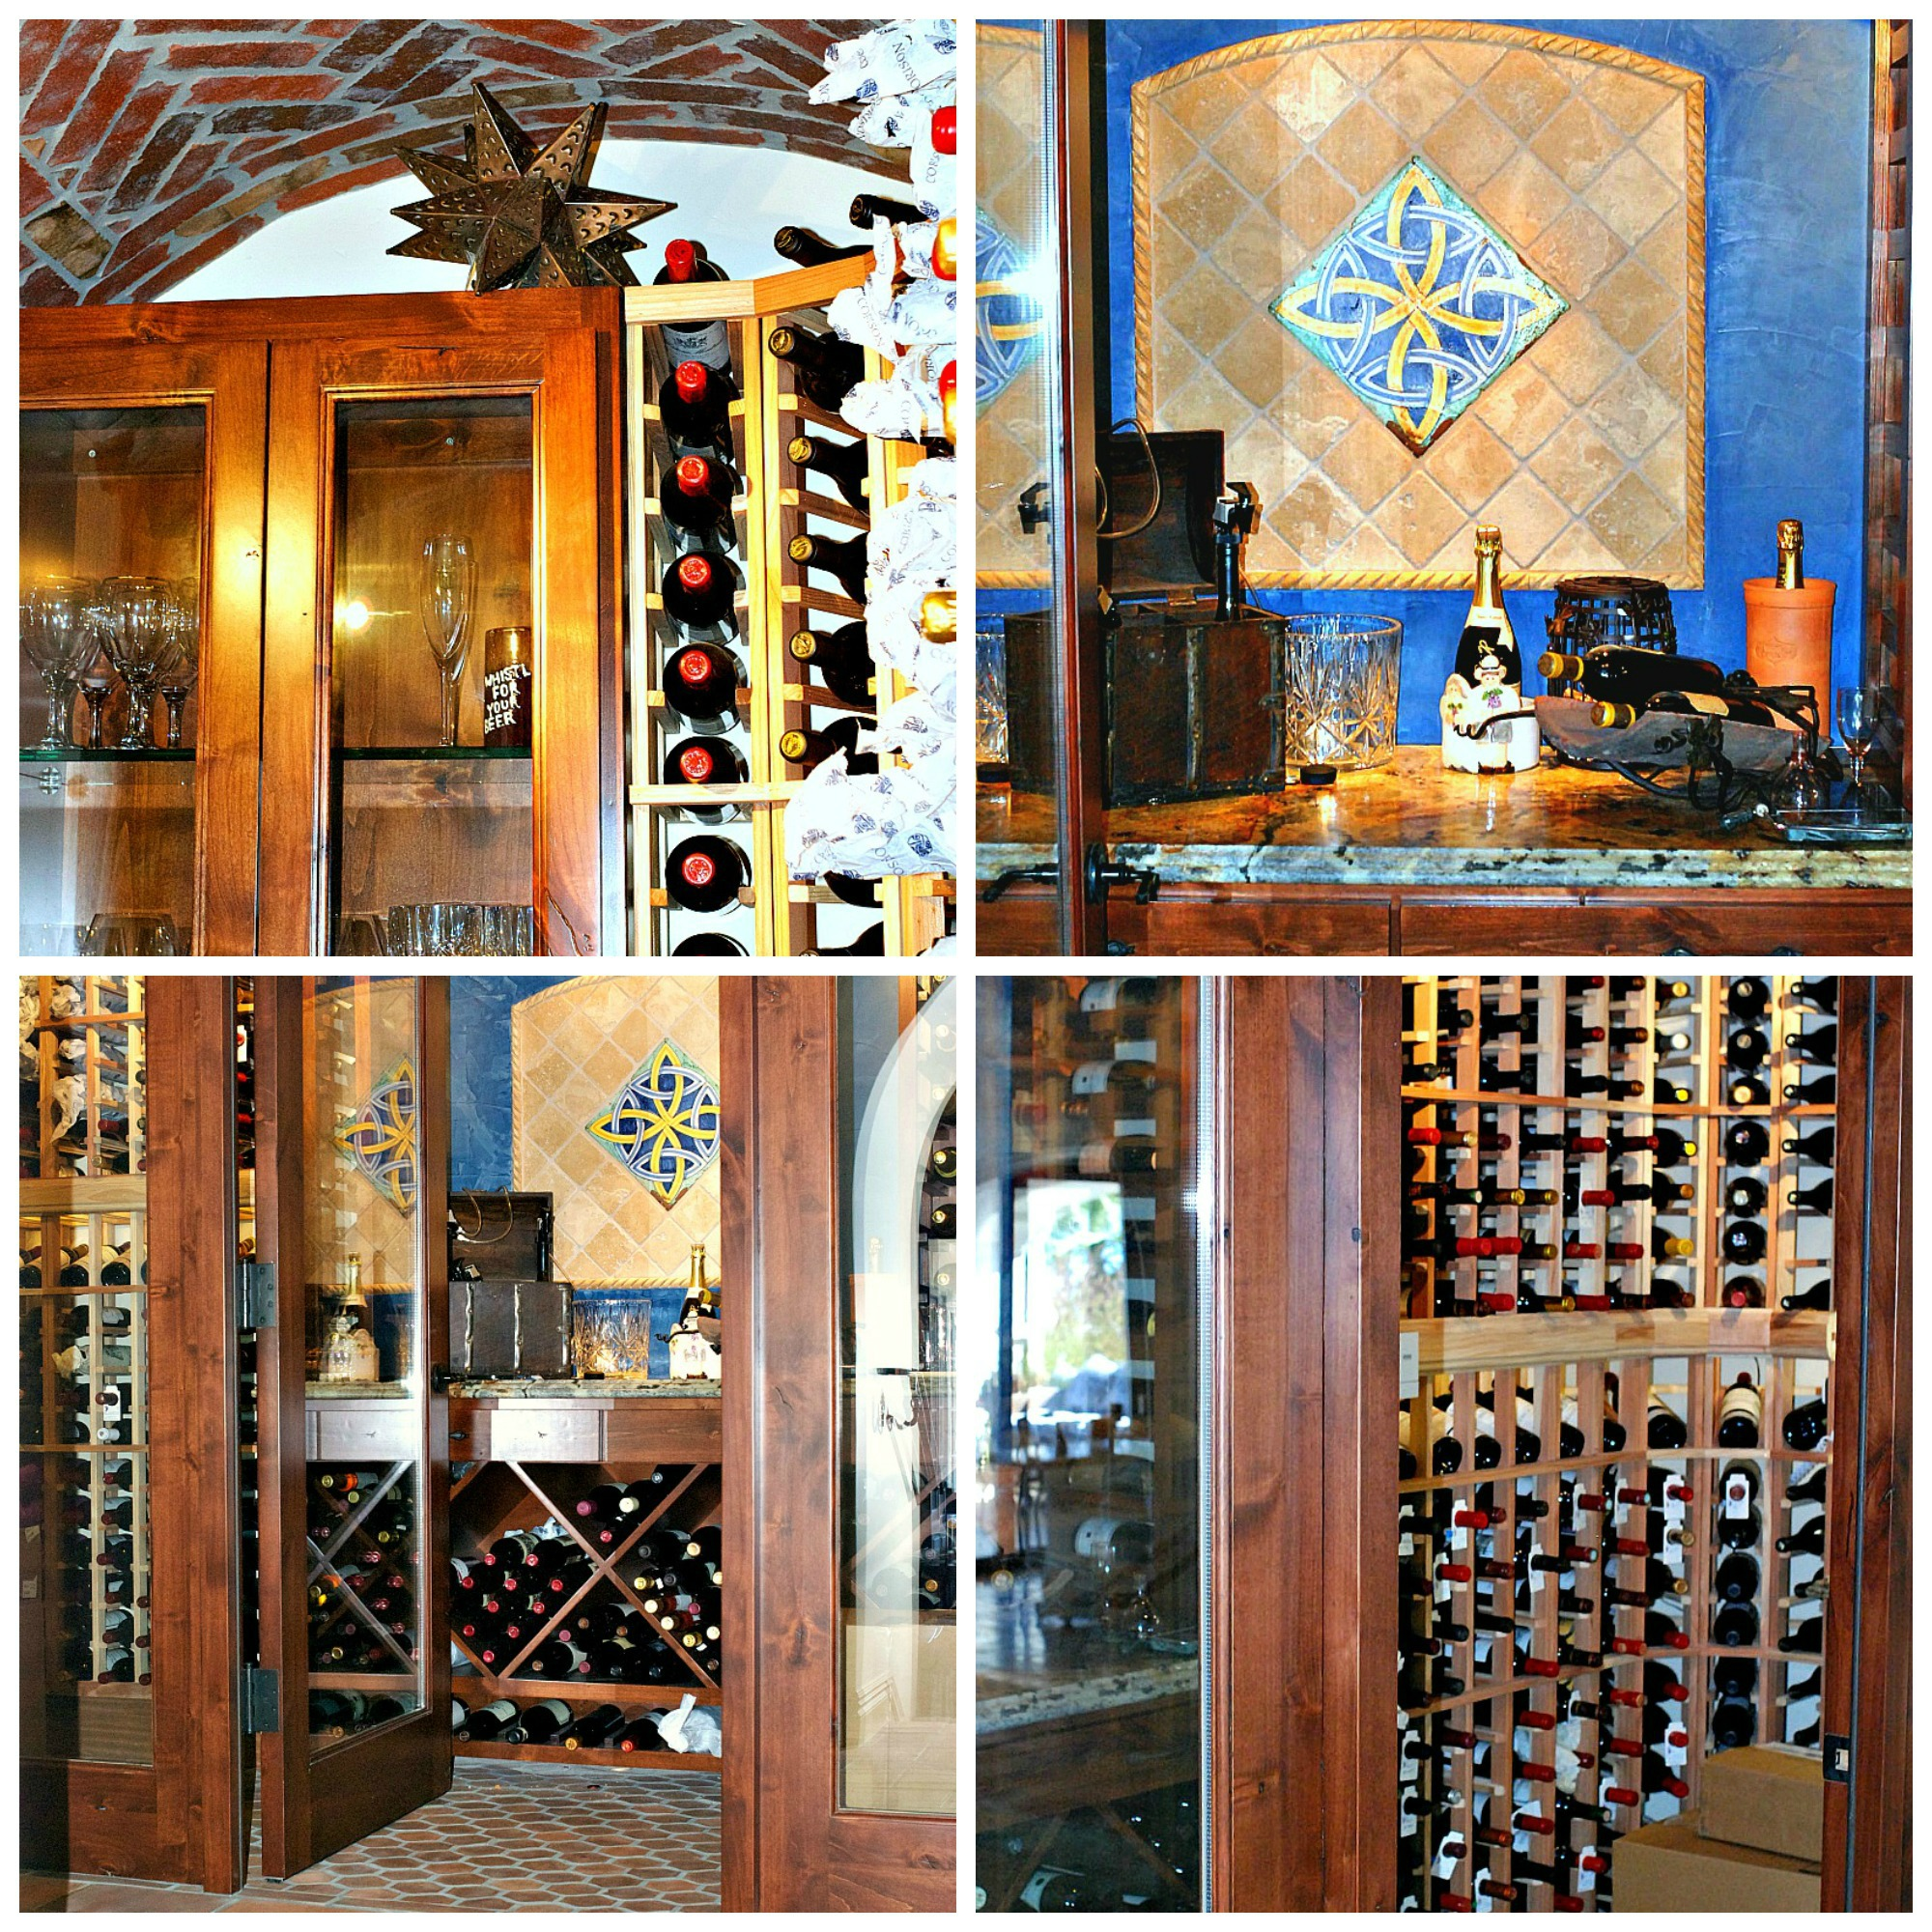 P&B wine cellar Collage